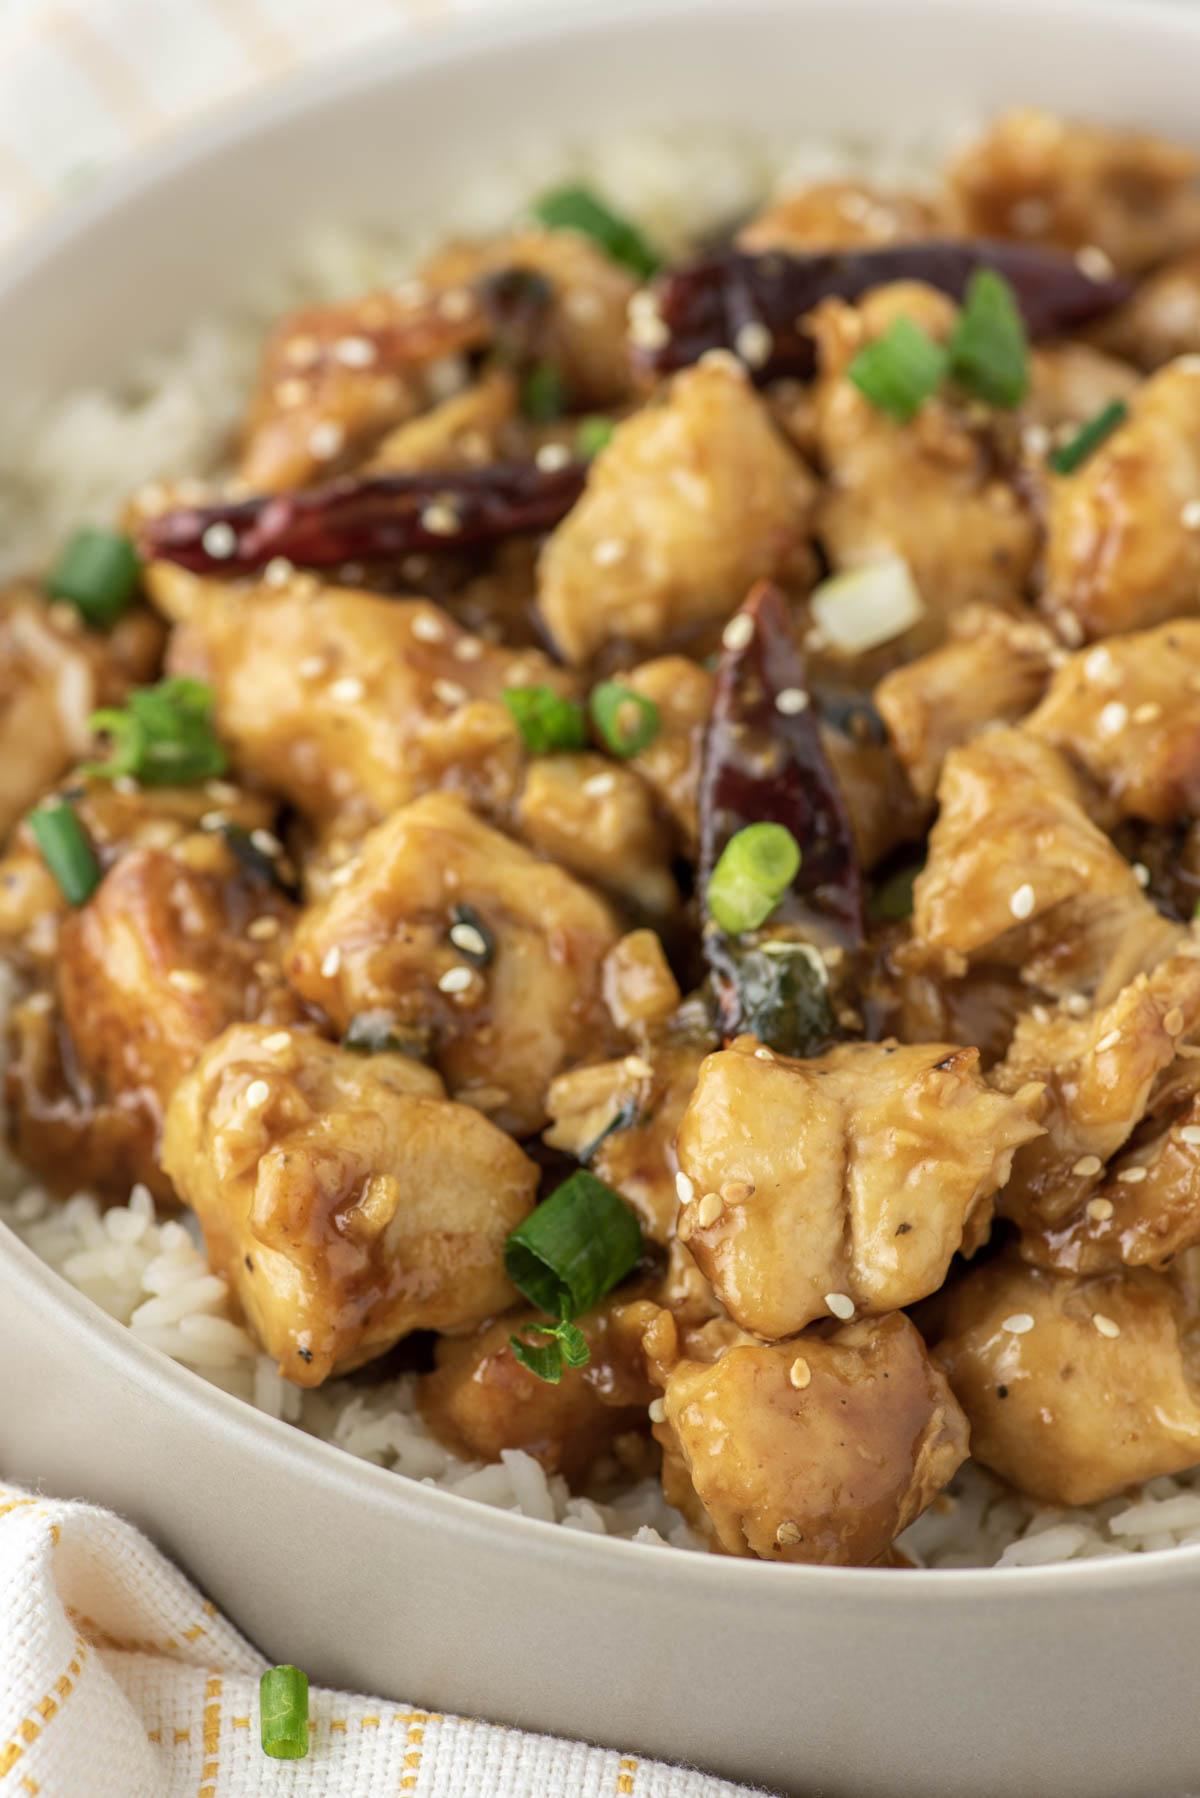 General Tso's chicken in grey bowl